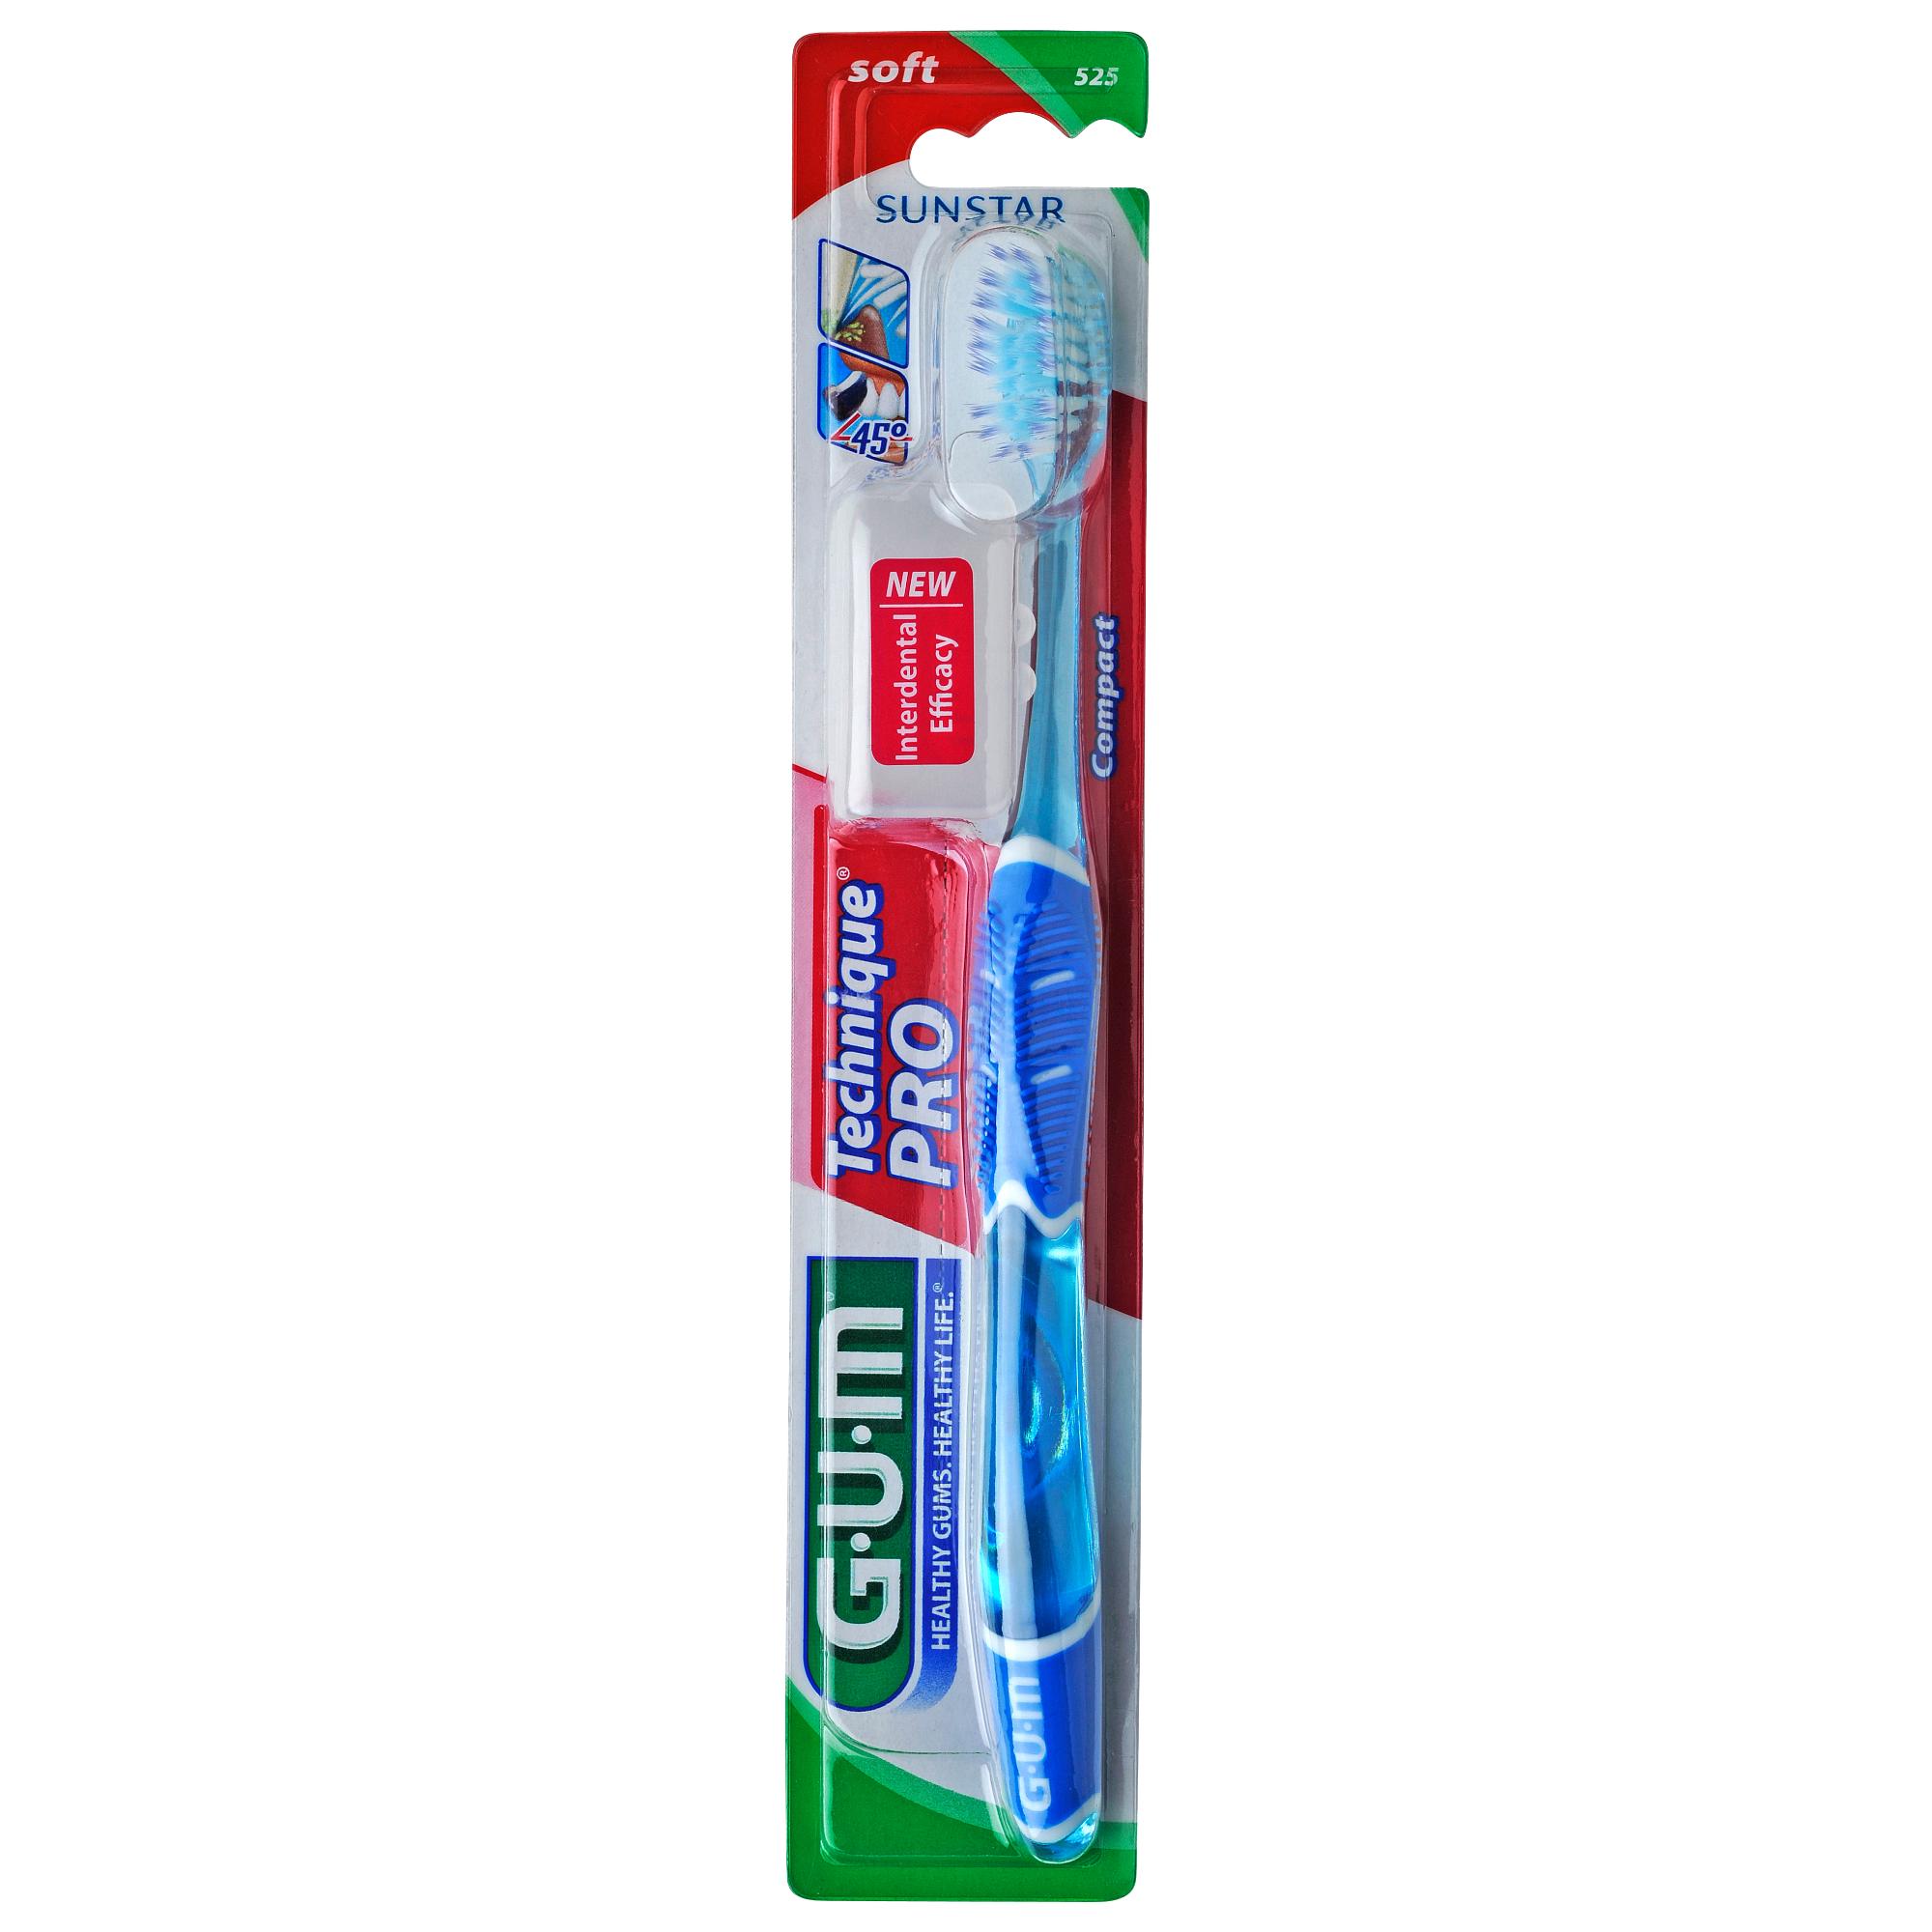 Gum Technique PRO Compact Soft Οδοντόβουρτσα με Θήκη Προστασίας (525) – μπλέ